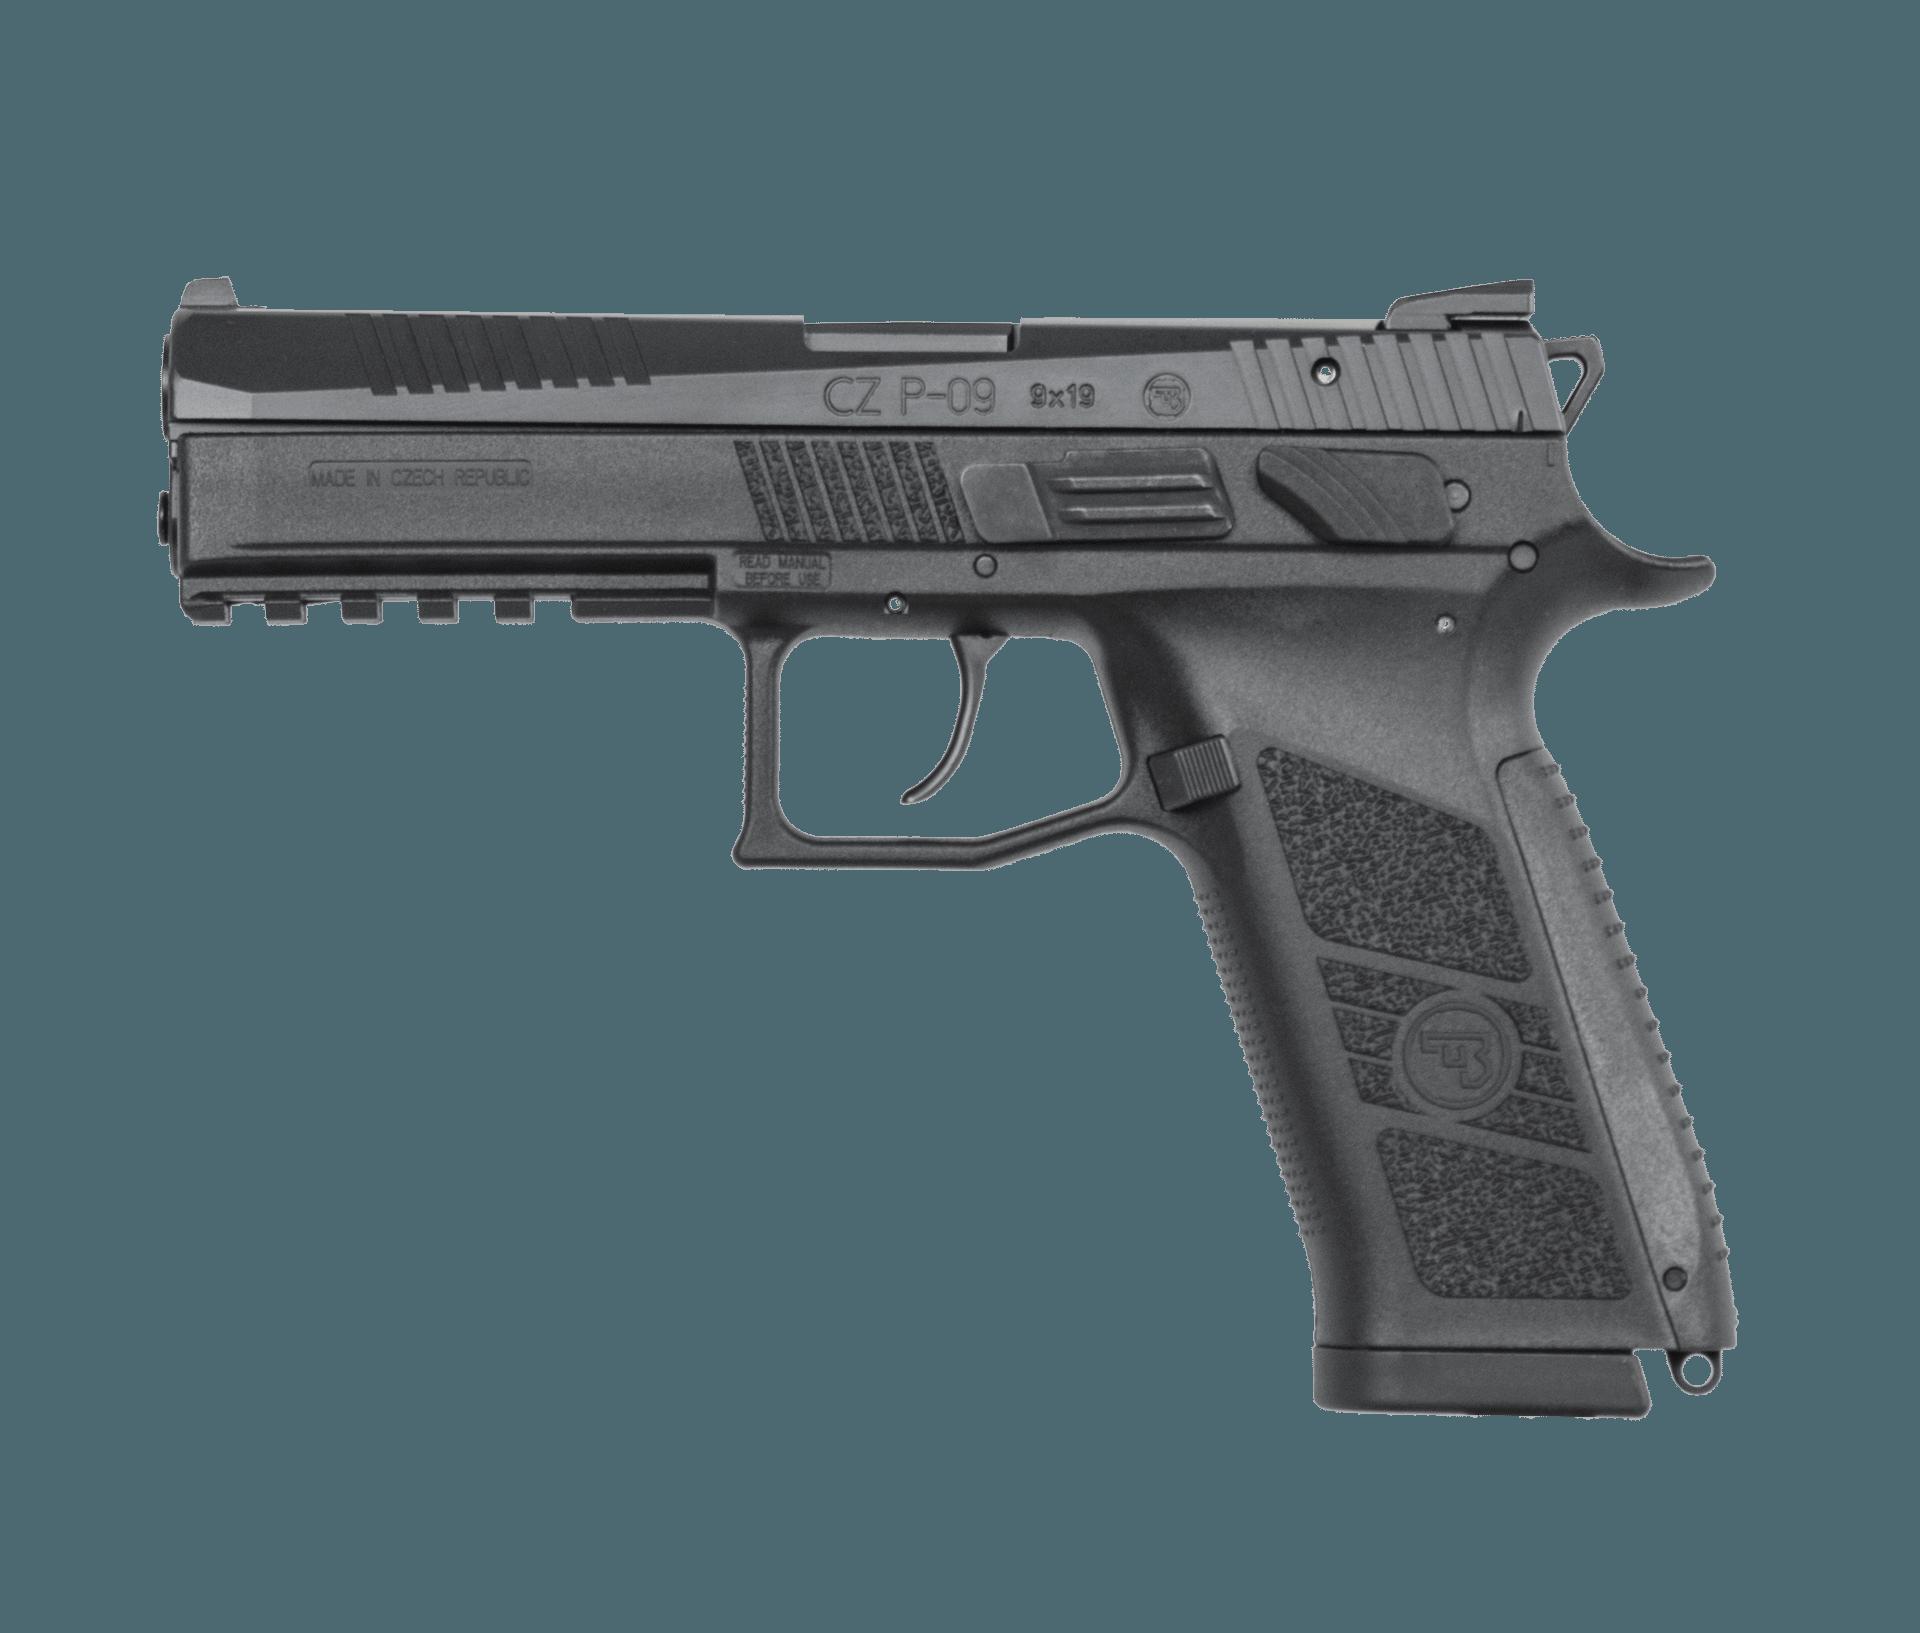 Pistolj CZ P-09 Tritium 9x19mm Zbrojovka